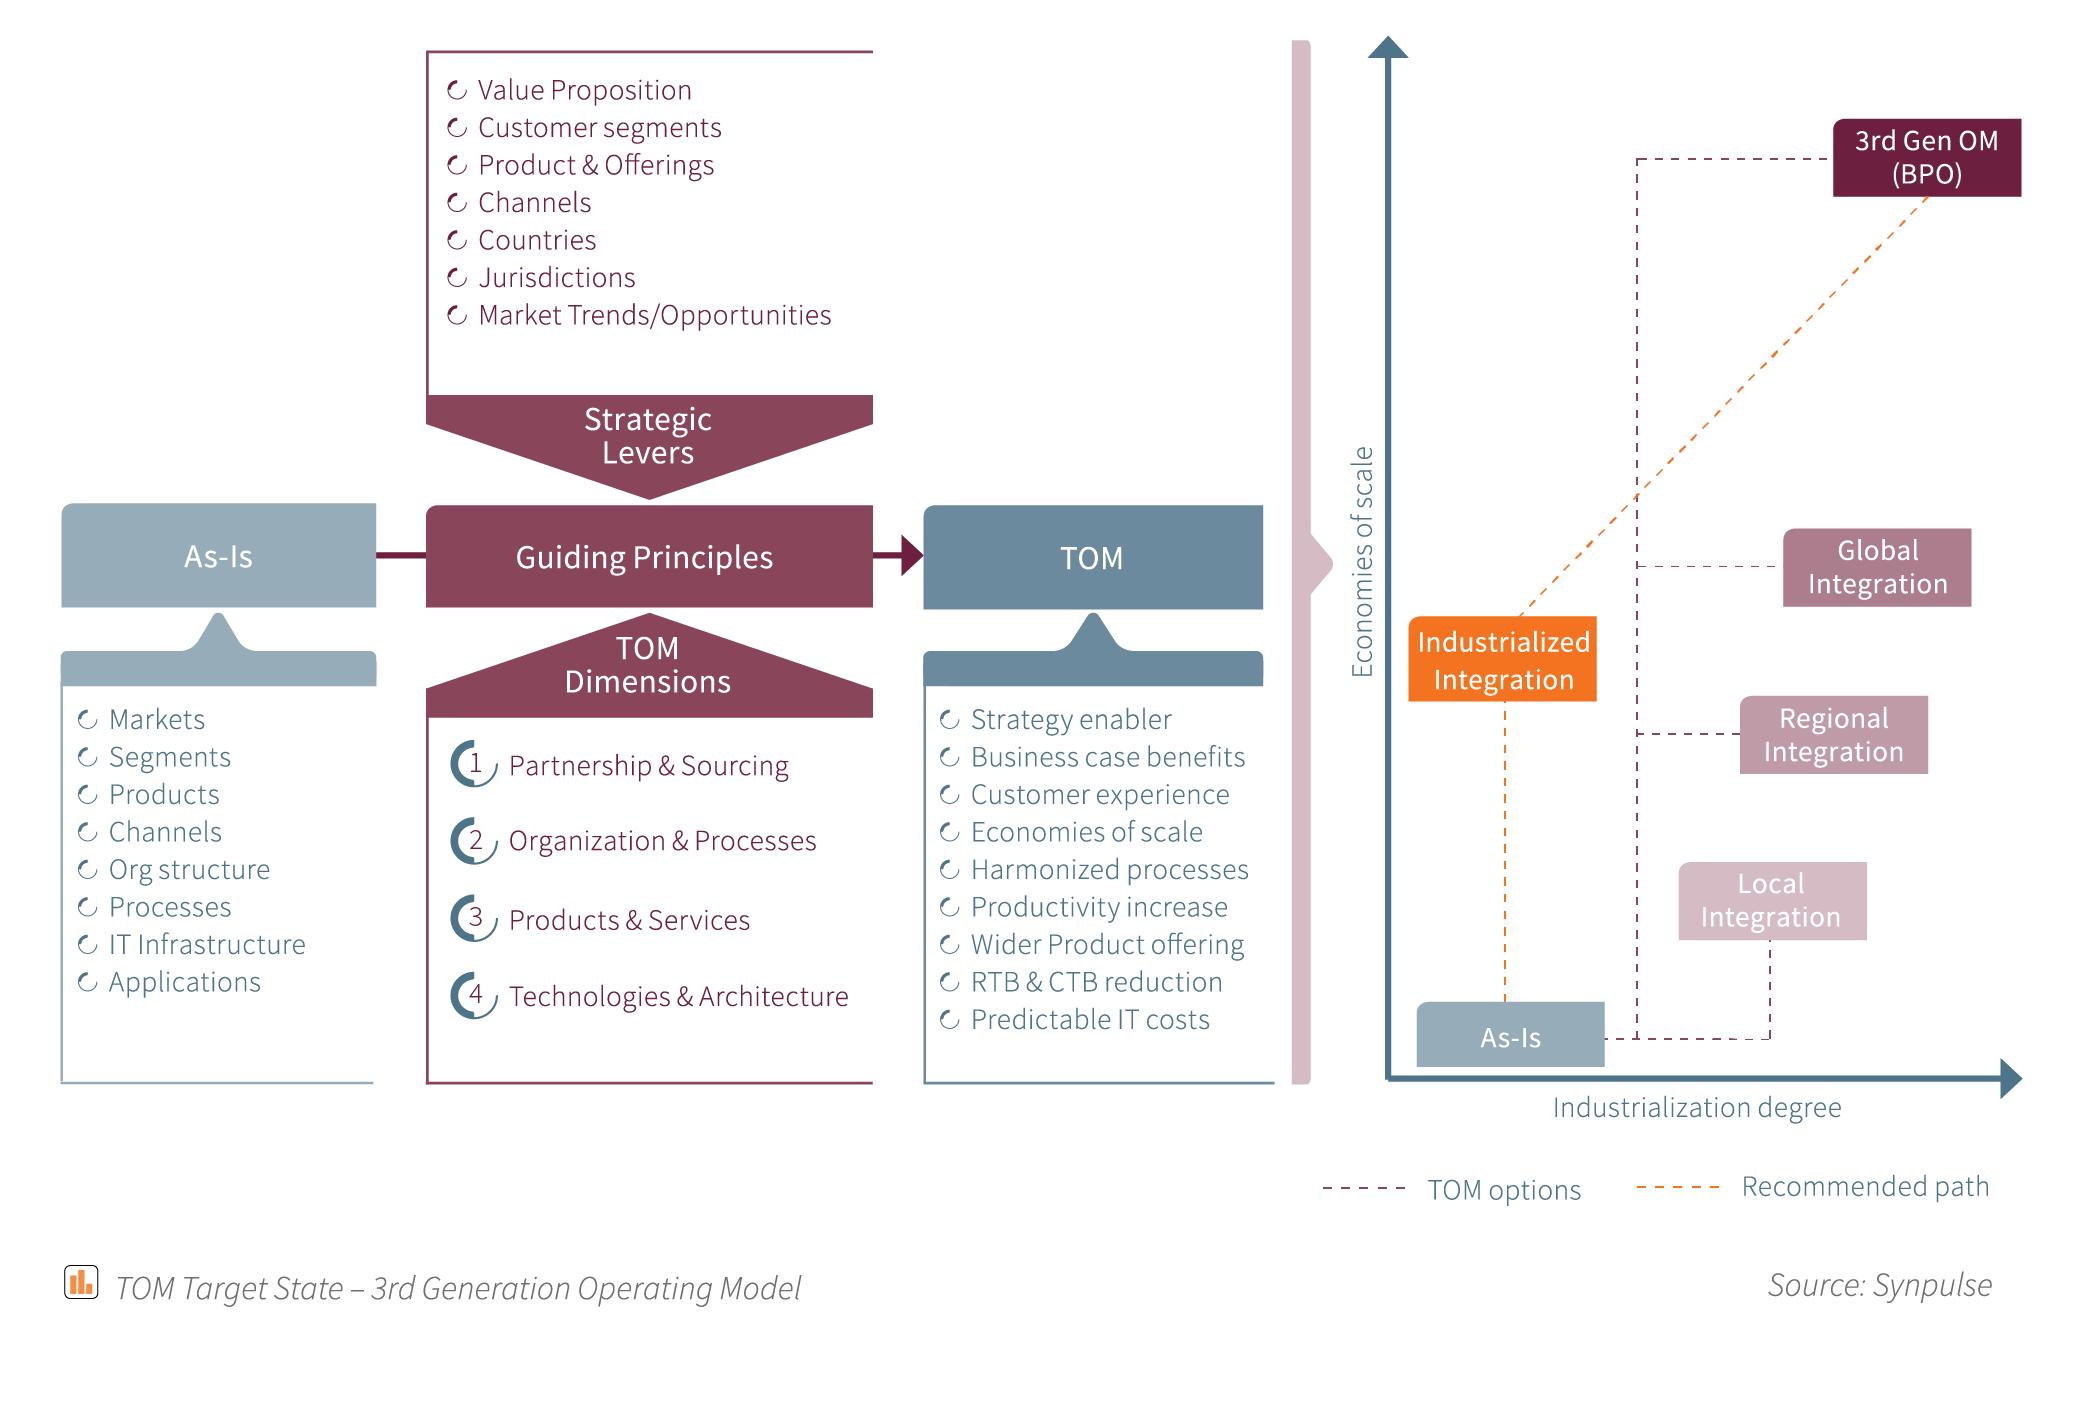 graphics_forpriyanka_tom-target-state-3rd-generation-operating-model